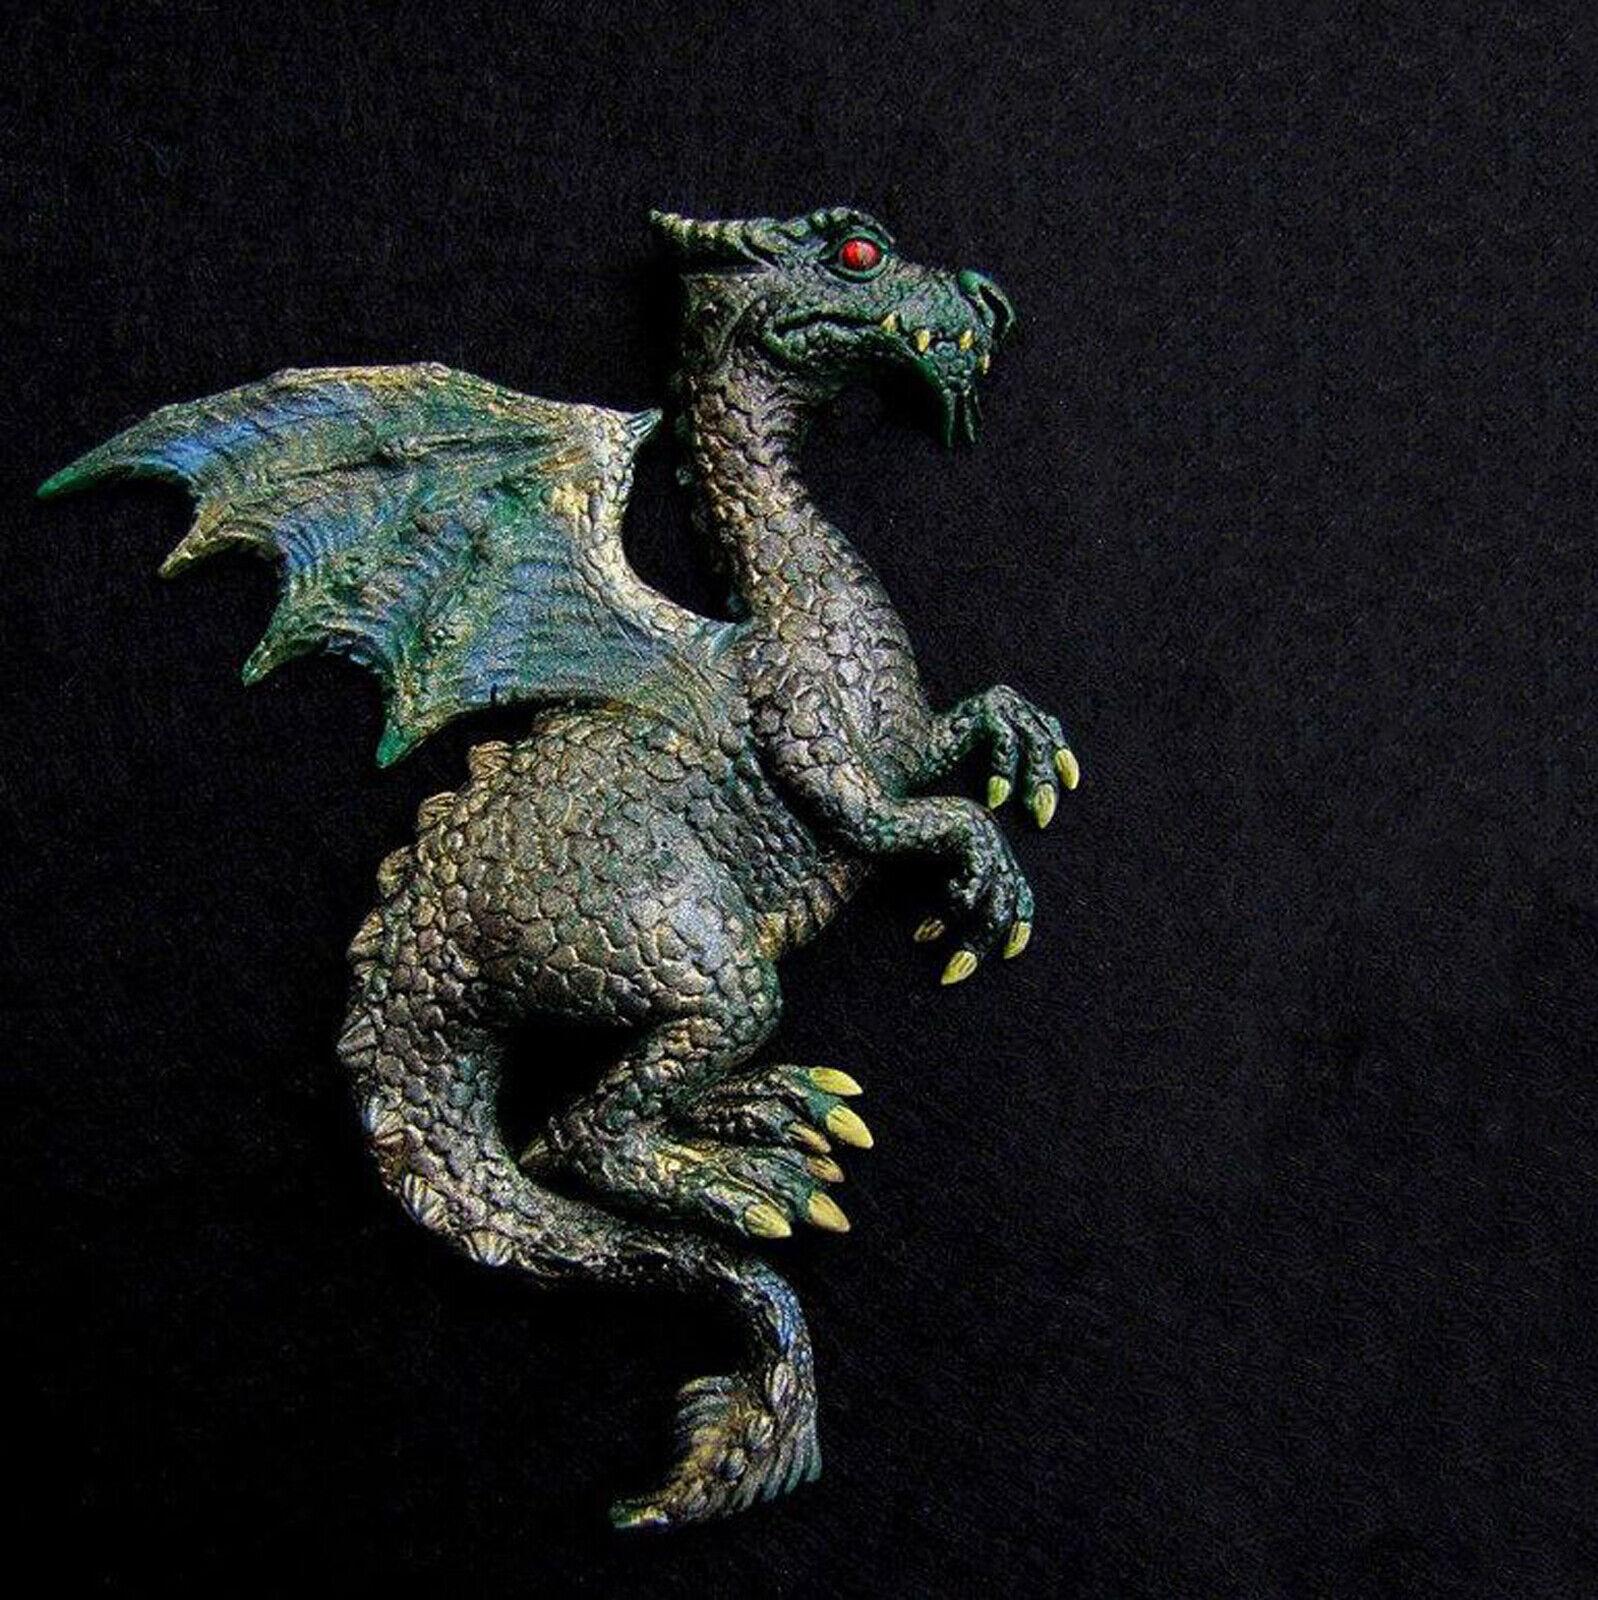 Dragon Shape Silicone Mould Chocolate Candy Sugarcraft Fondant Cake Decor Mold